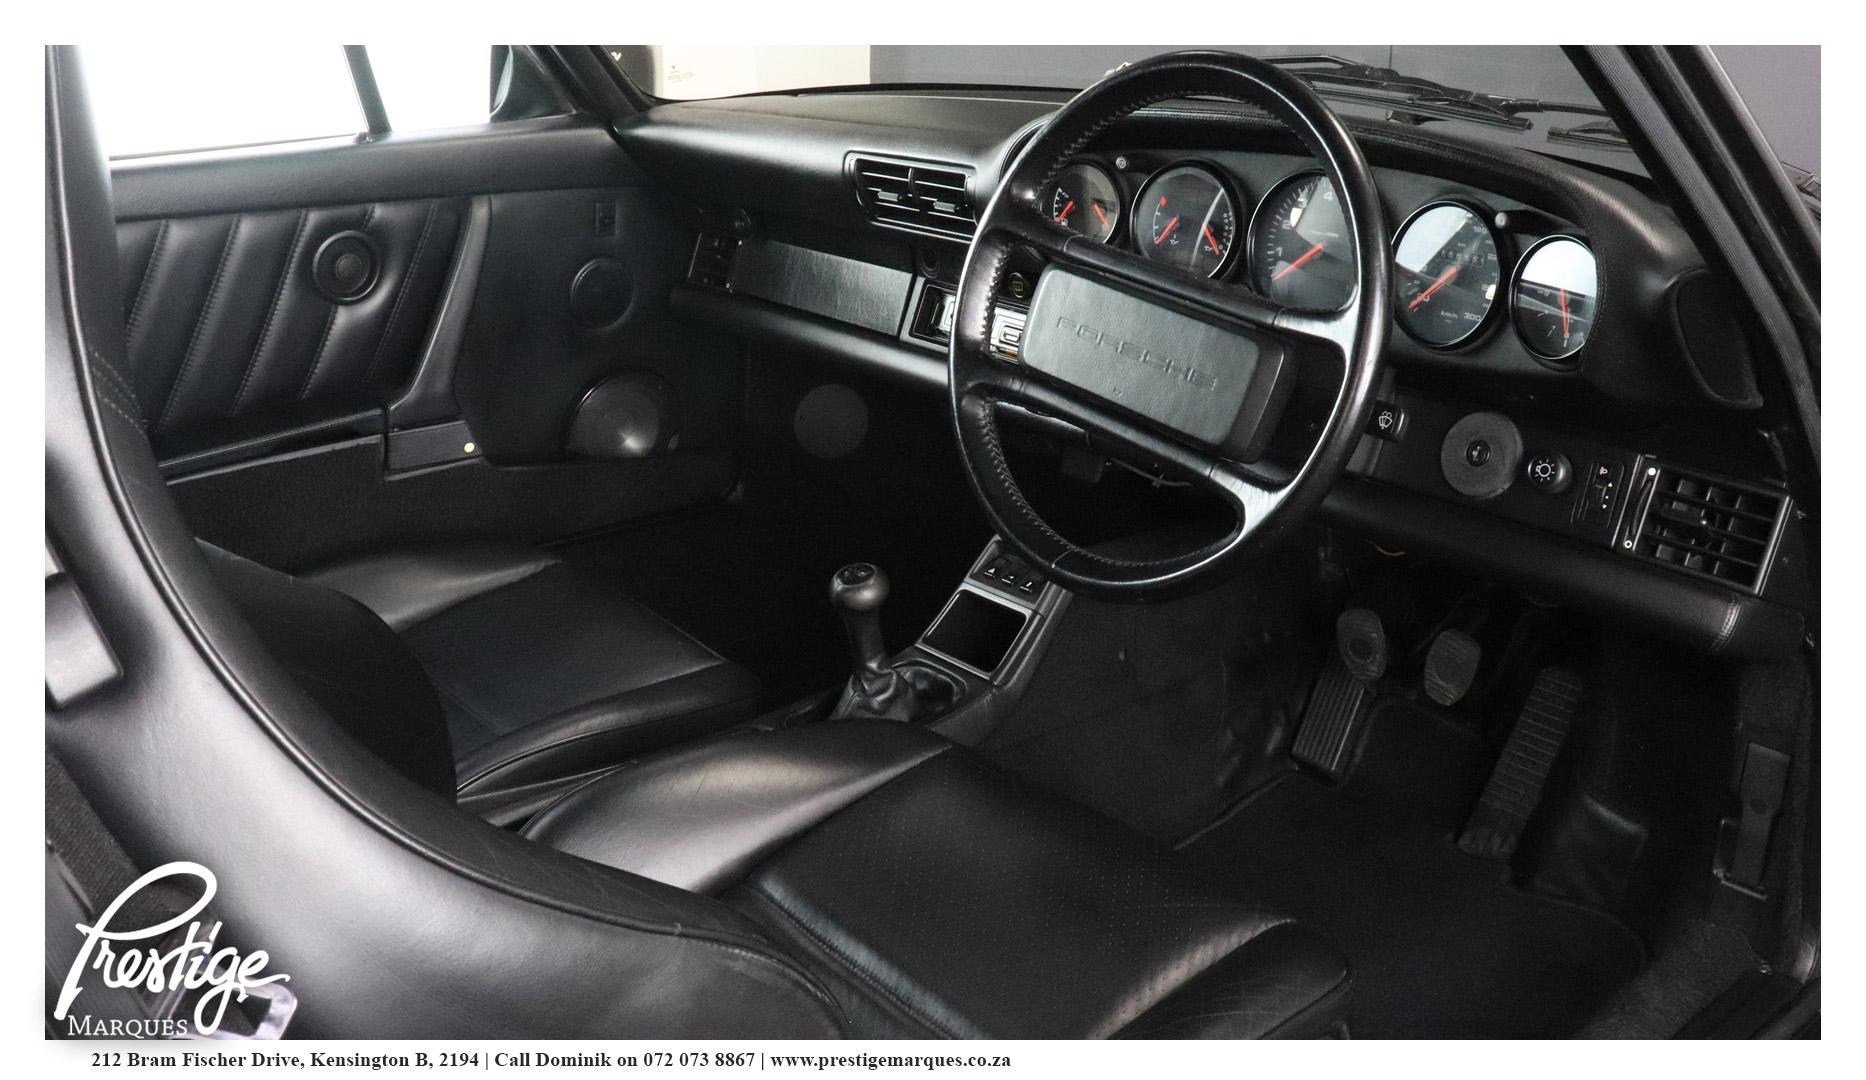 Porsche-911-964-turbo-3:3-Prestige-Marques-Sandton-Randburg-14